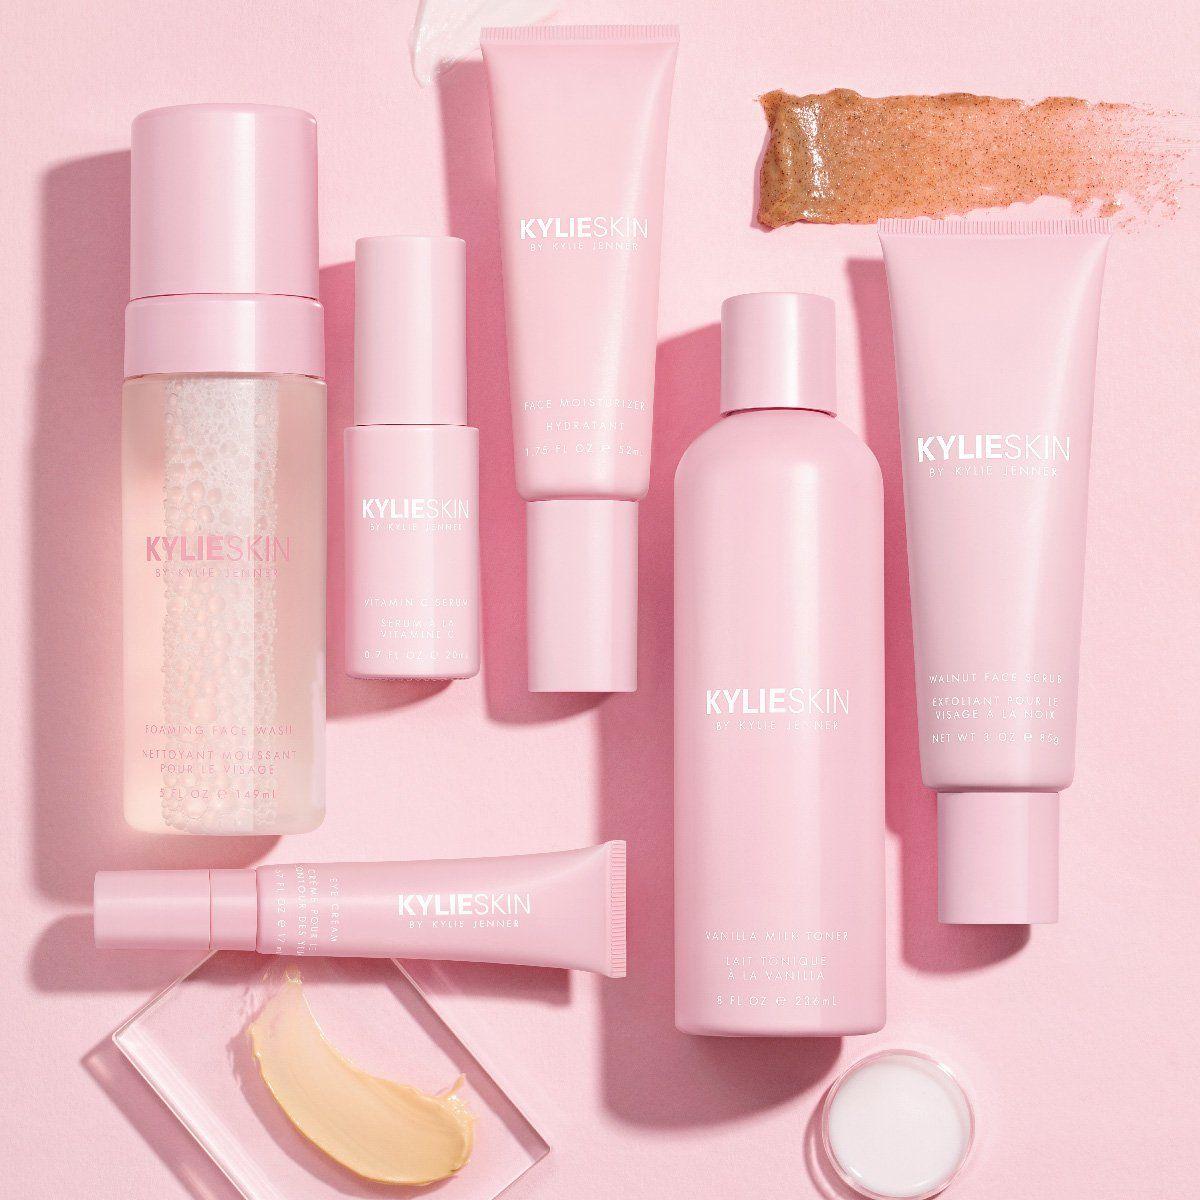 Kylie Skin Set Beauty Skin Kylie Jenner Makeup Skin Care